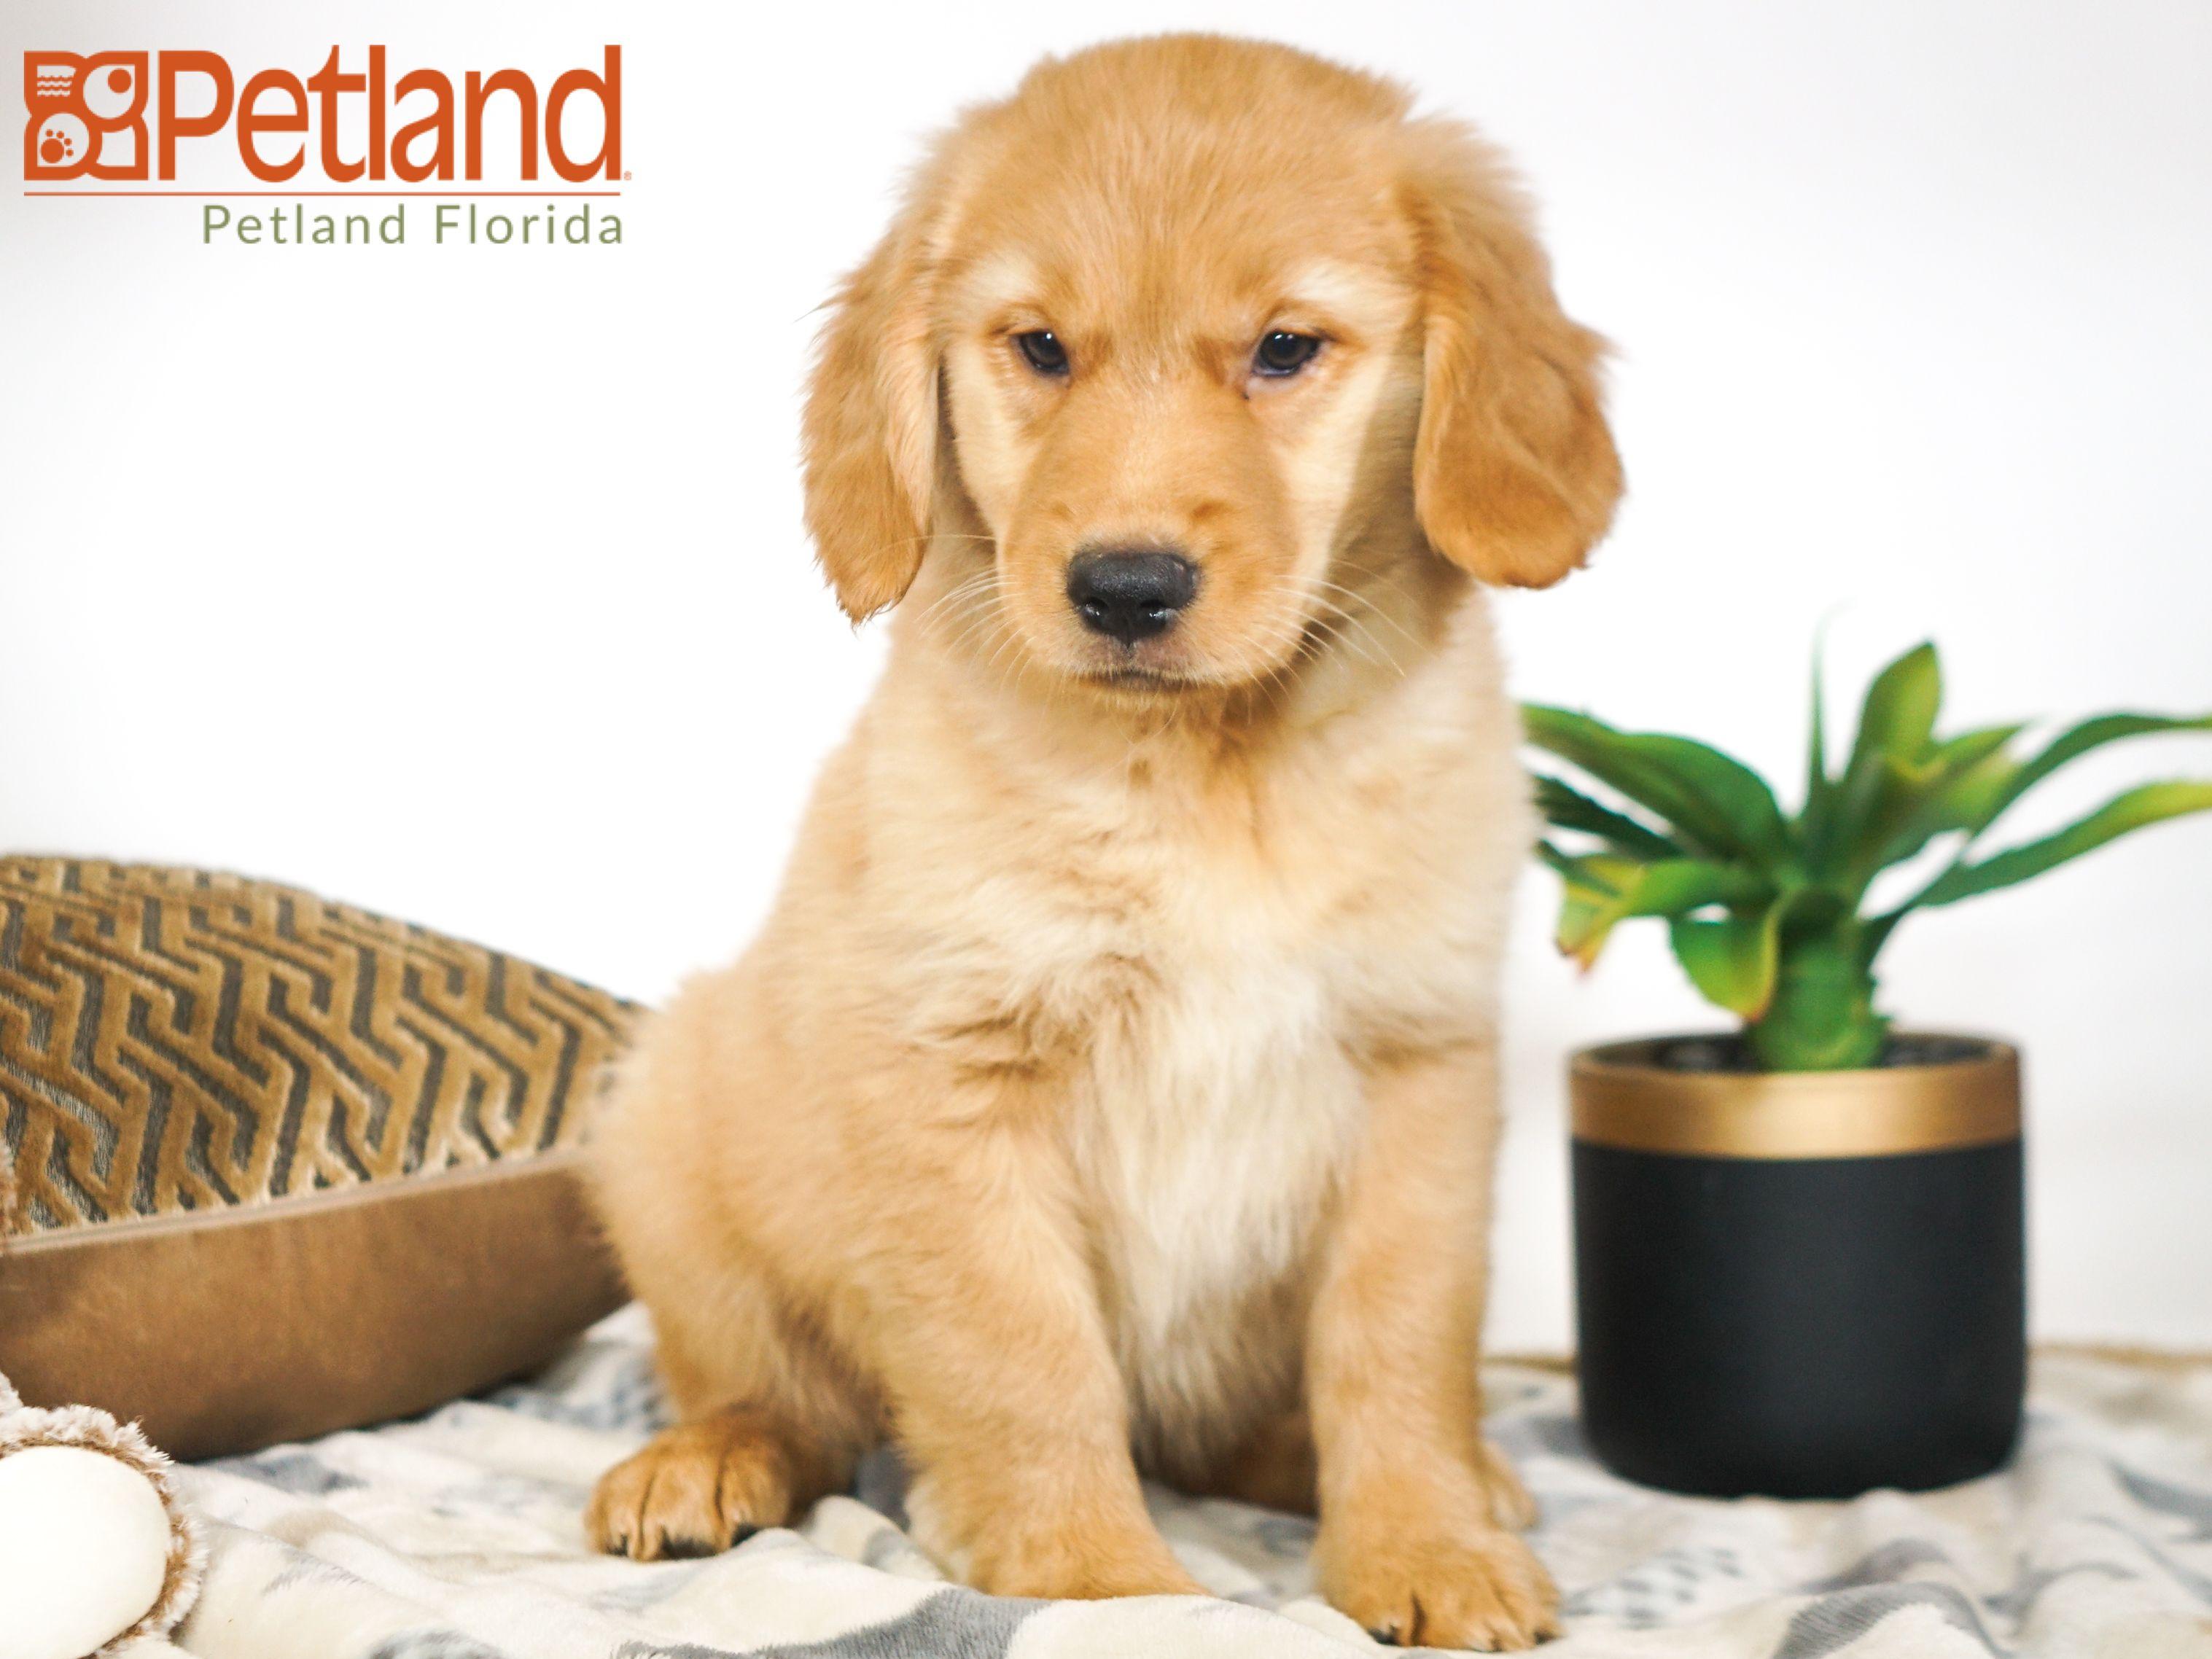 Petland Florida has Golden Retriever puppies for sale